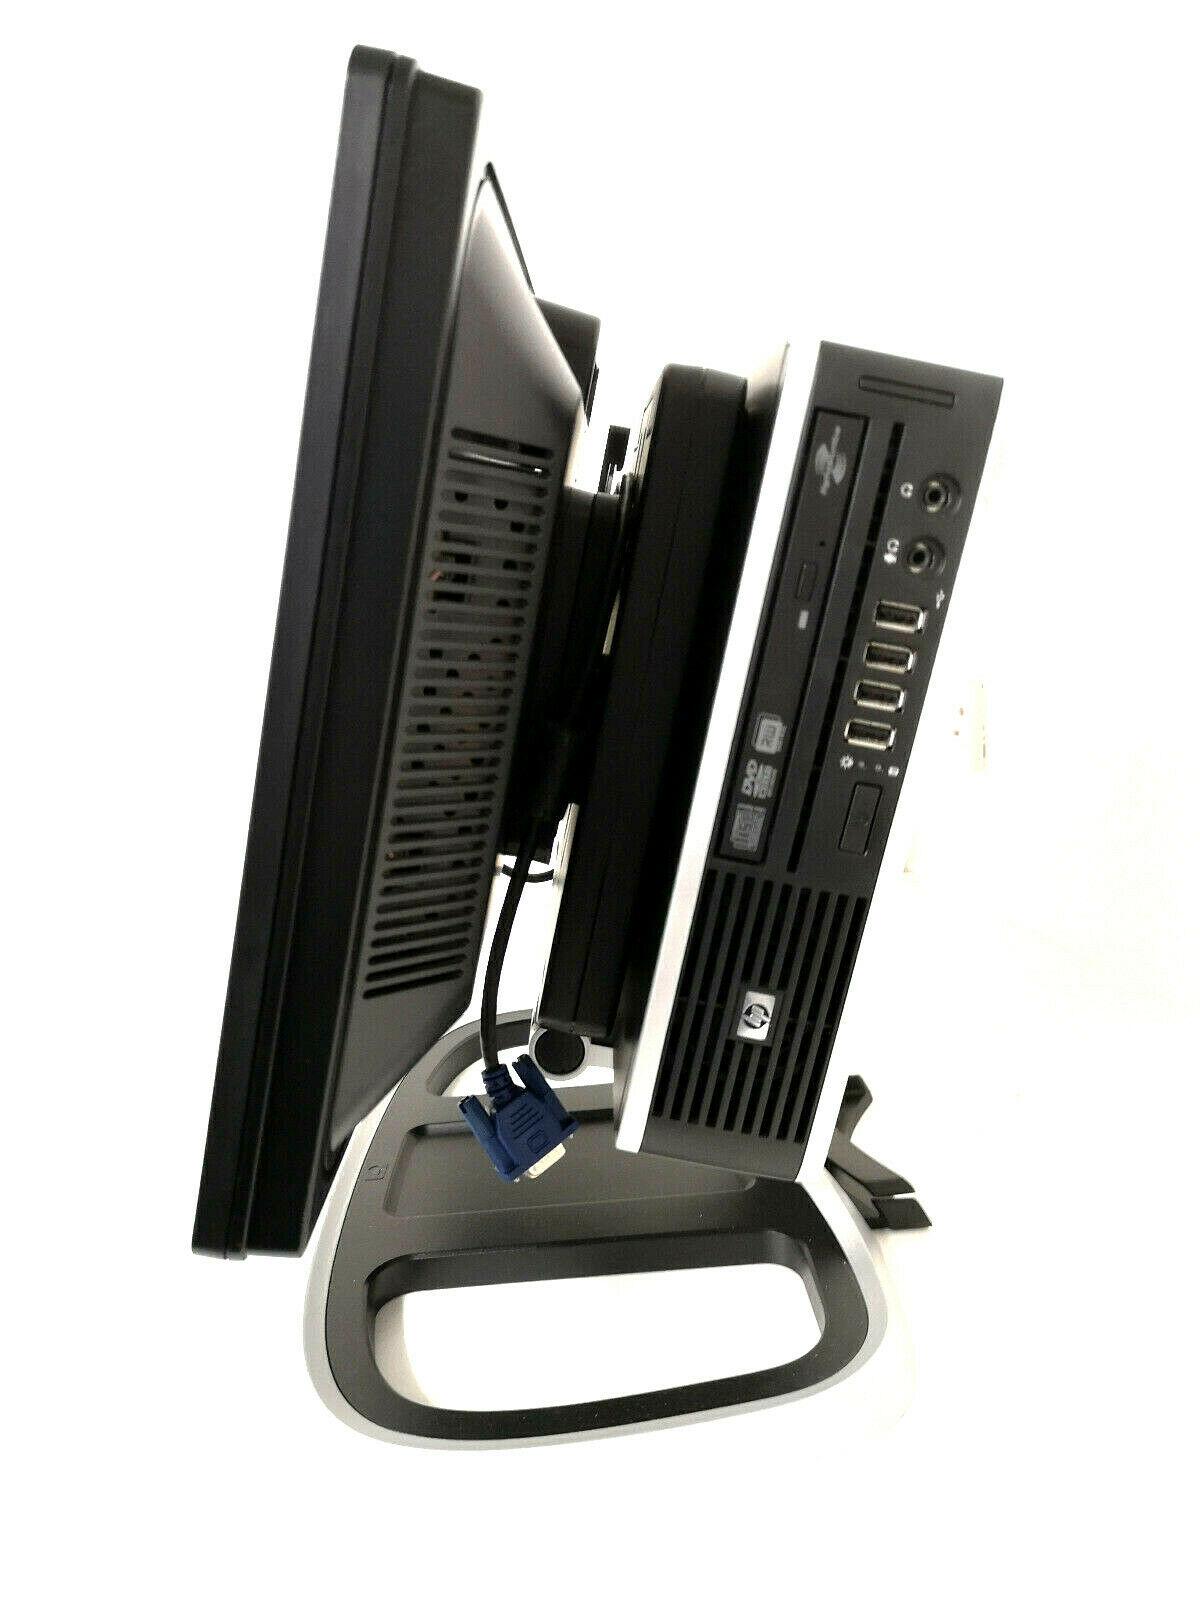 HP 8000 USFF No 2